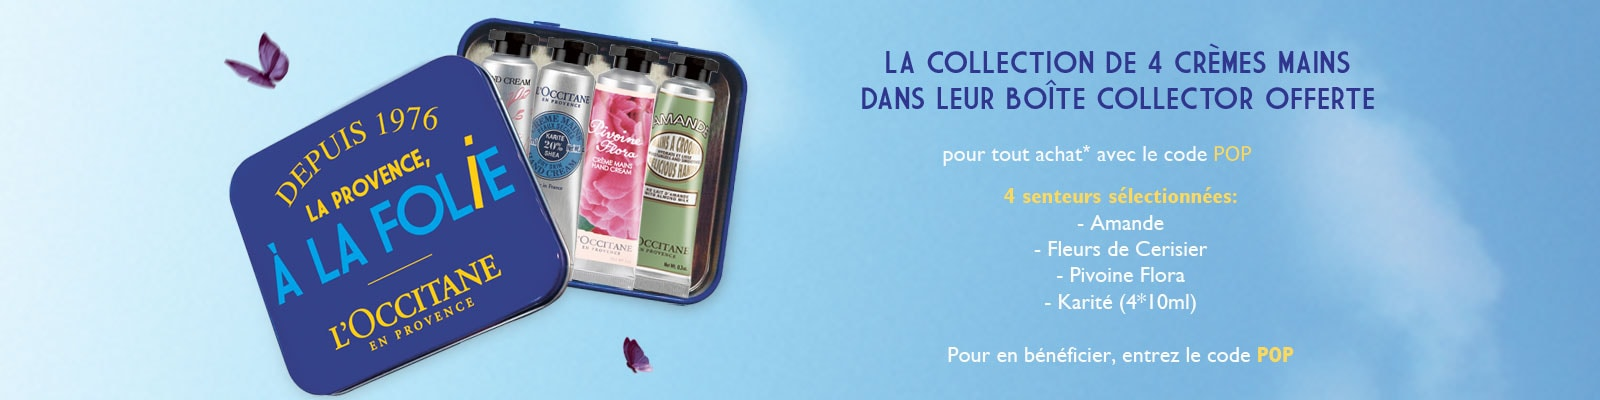 Boîte collector - L'Occitane en Provence